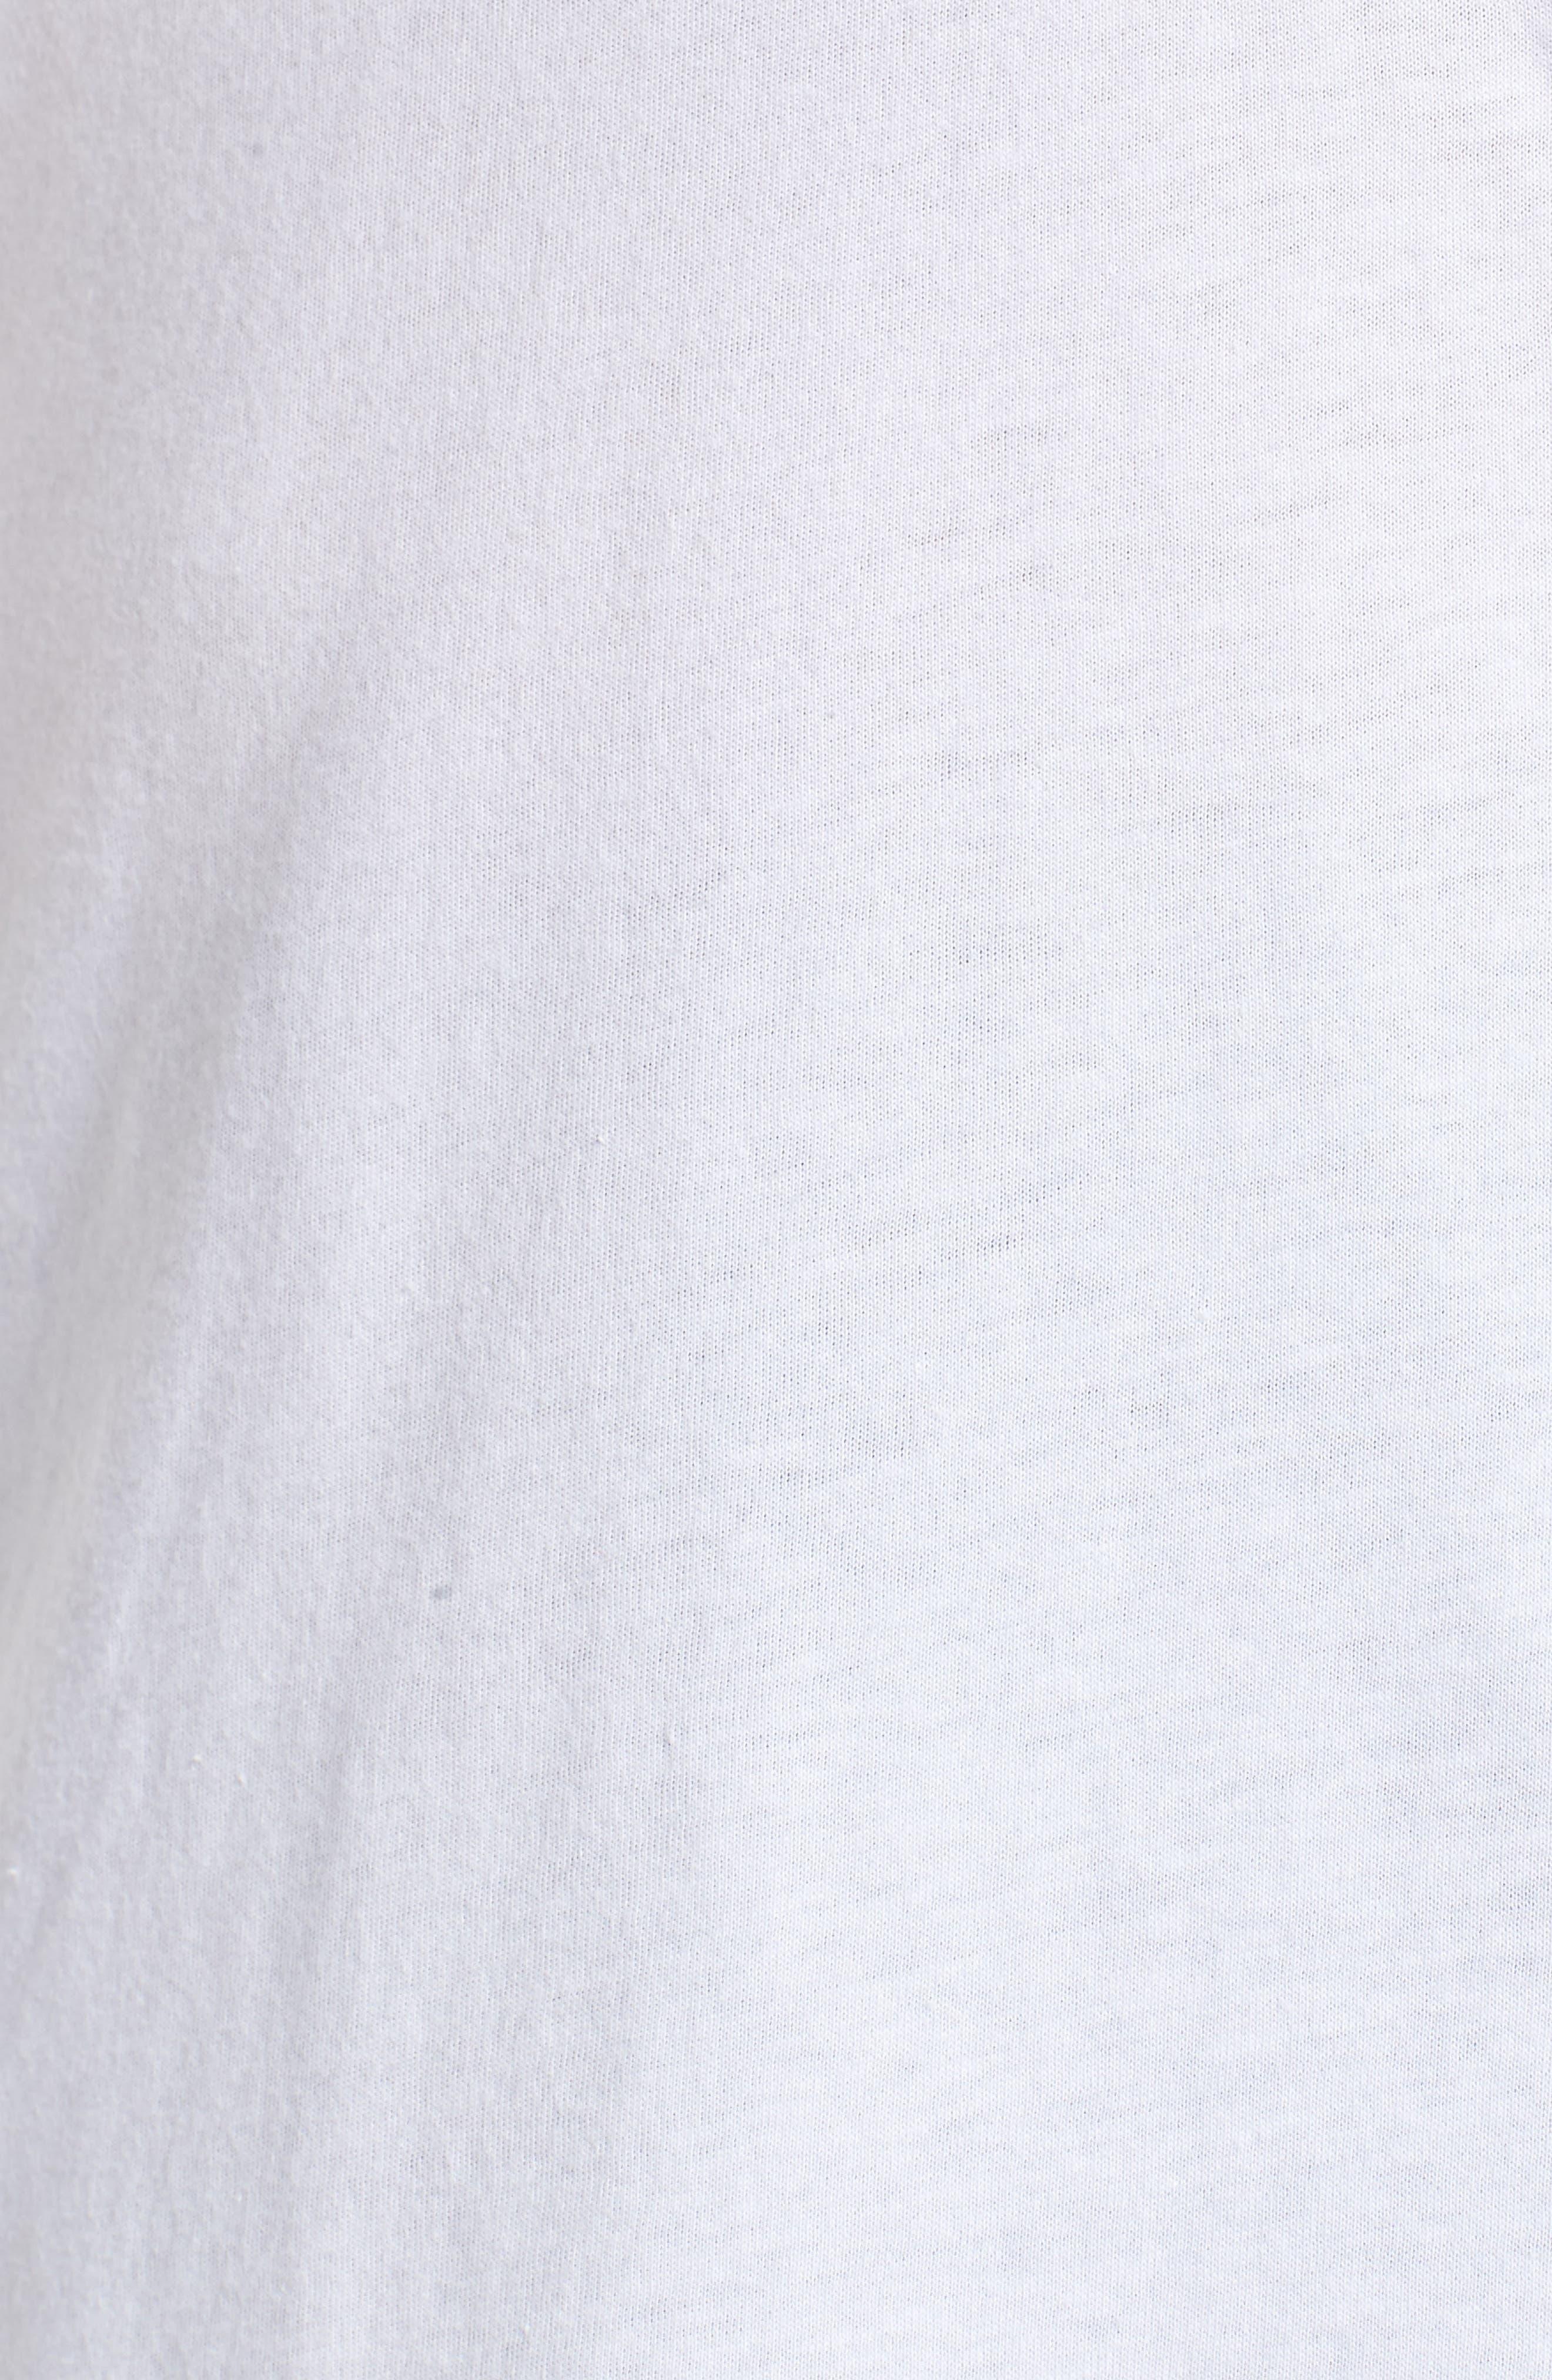 Varsity Stripe Tee,                             Alternate thumbnail 12, color,                             WHITE- RED BAROQUE COMBO